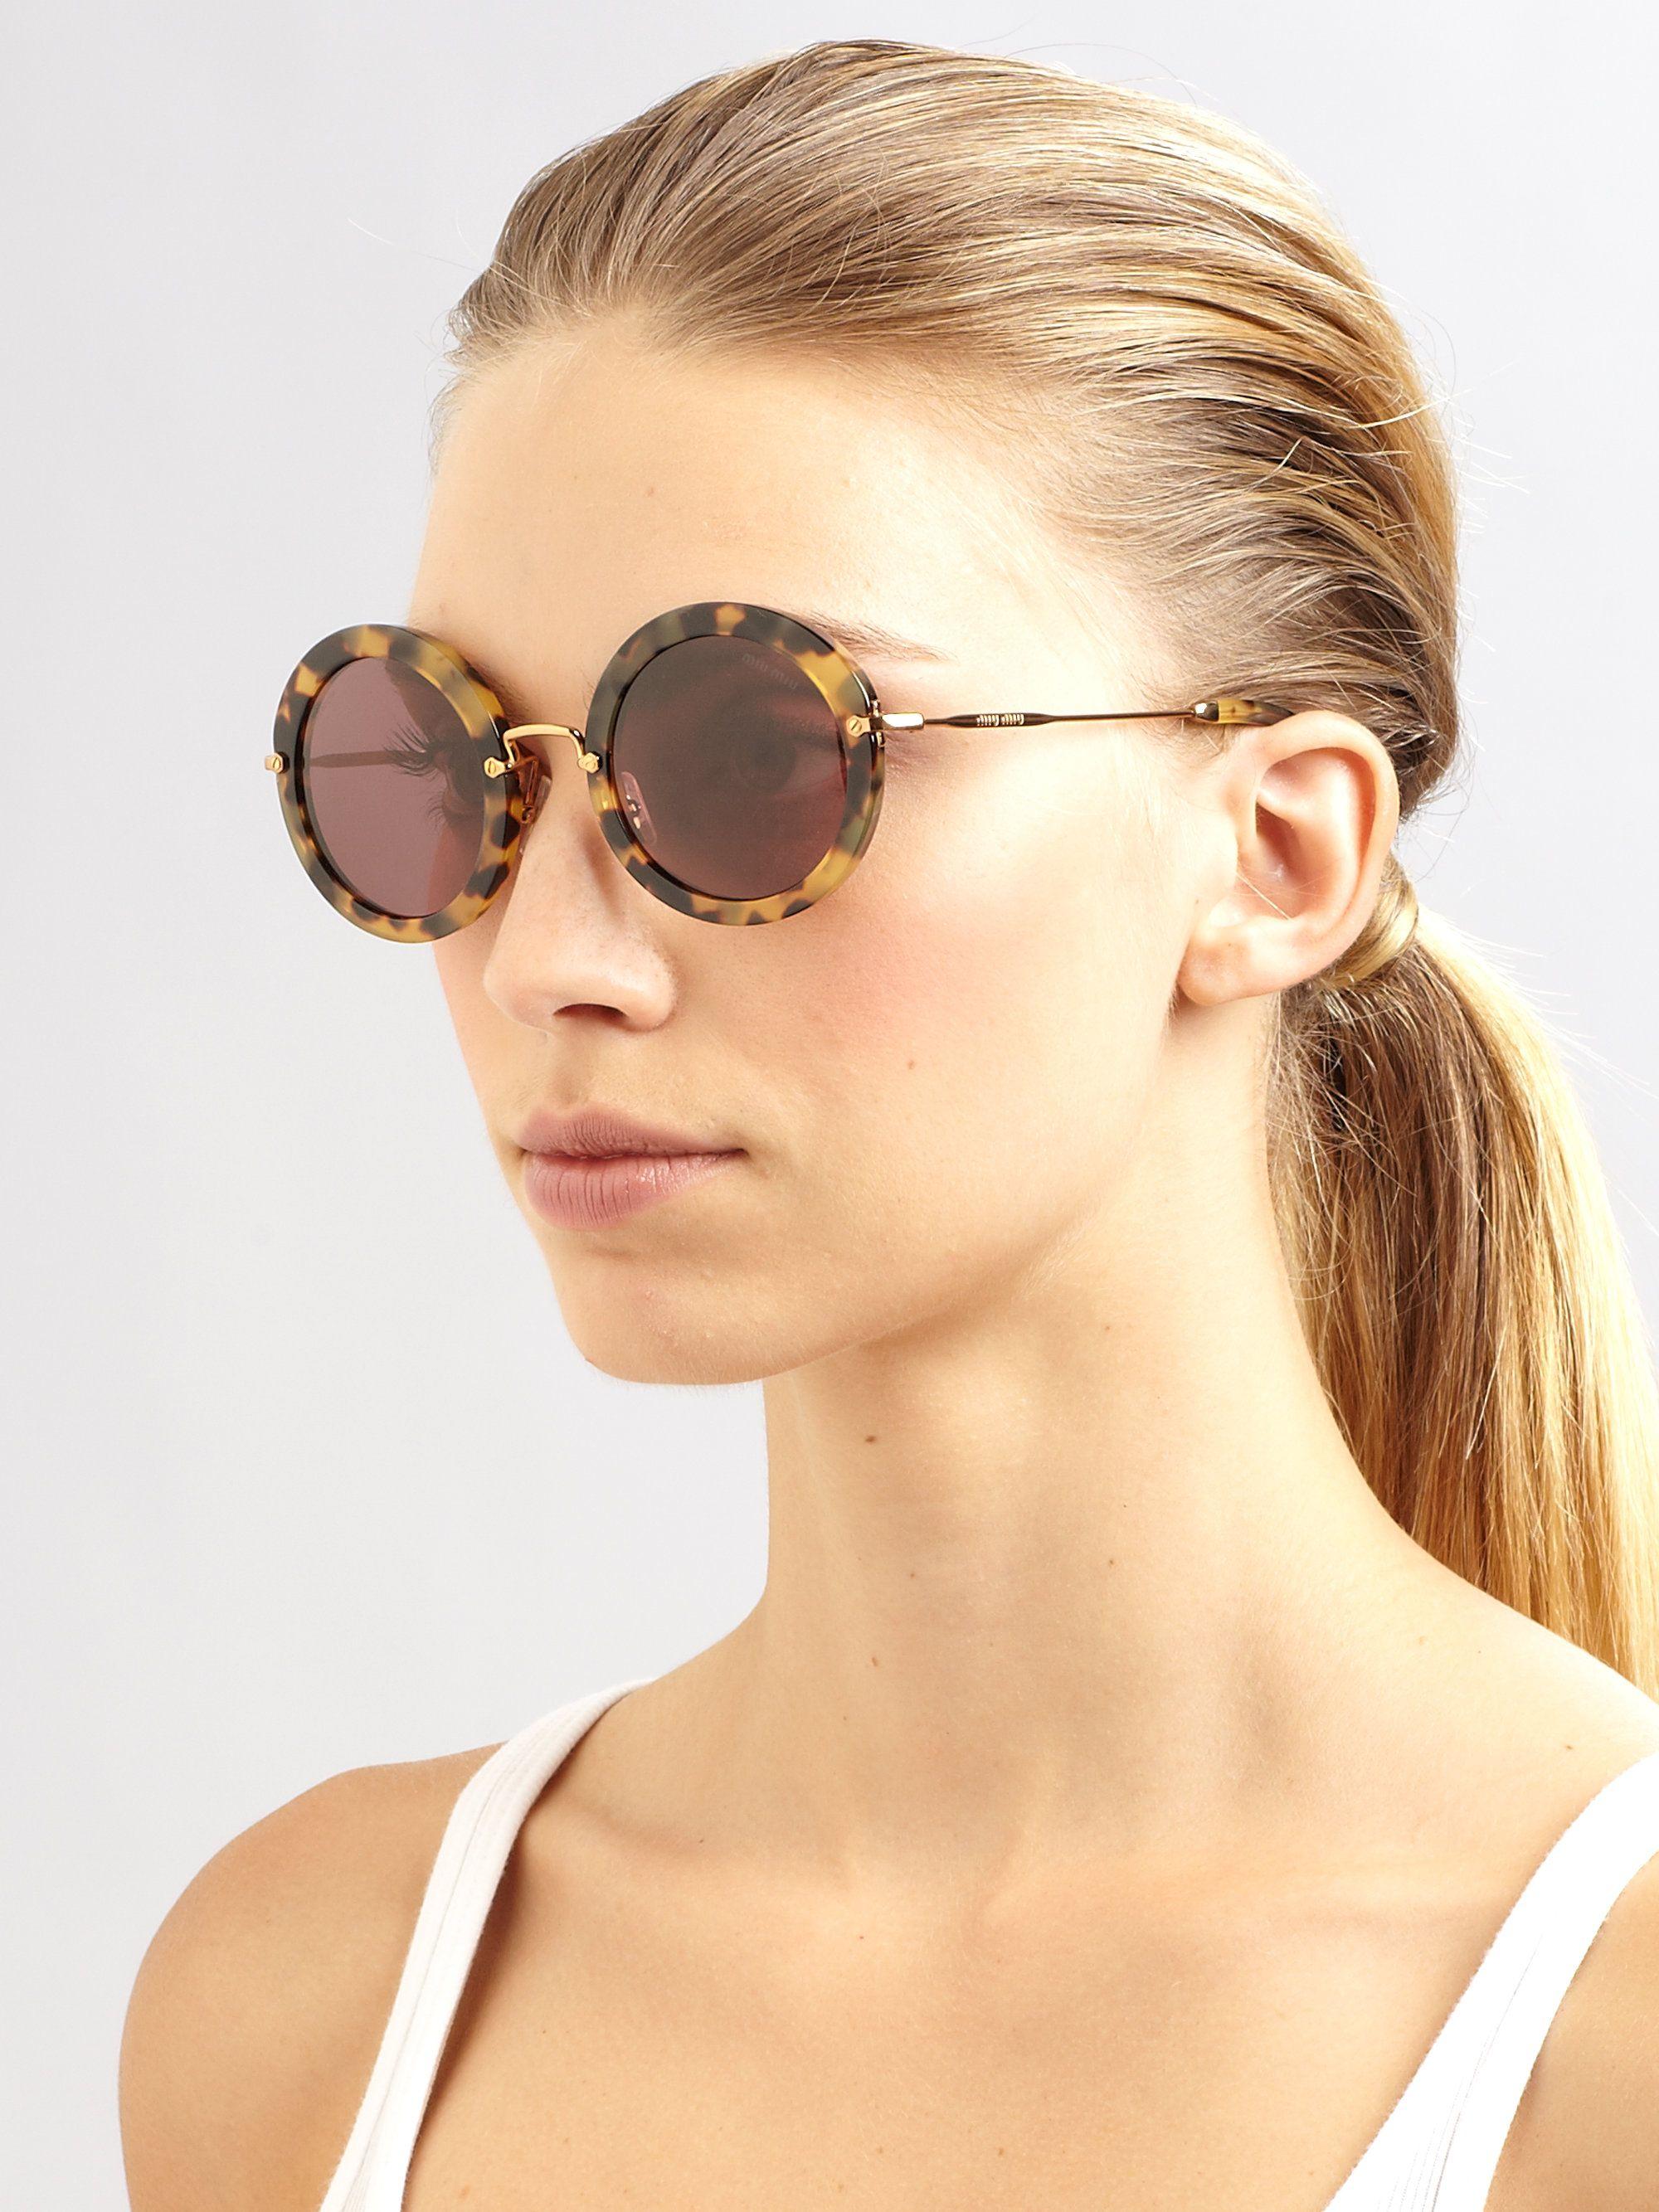 41c8a7681ef0 Miu Miu Brown Retro Noir Round Acetate Sunglasses